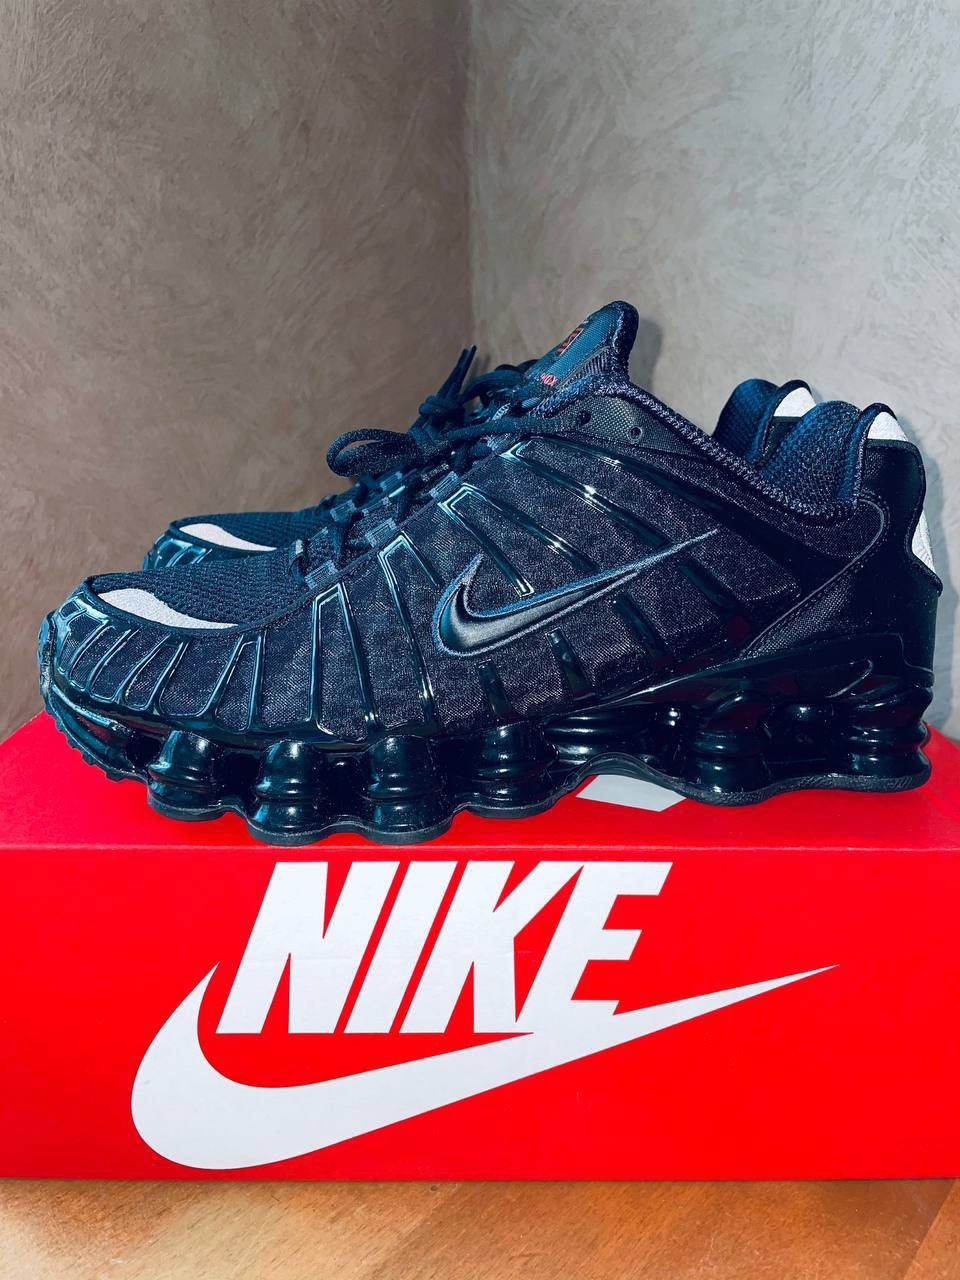 Nike NikeLab Shox TL Supreme Tn React Zoom ACG Size? Dunk Cdg